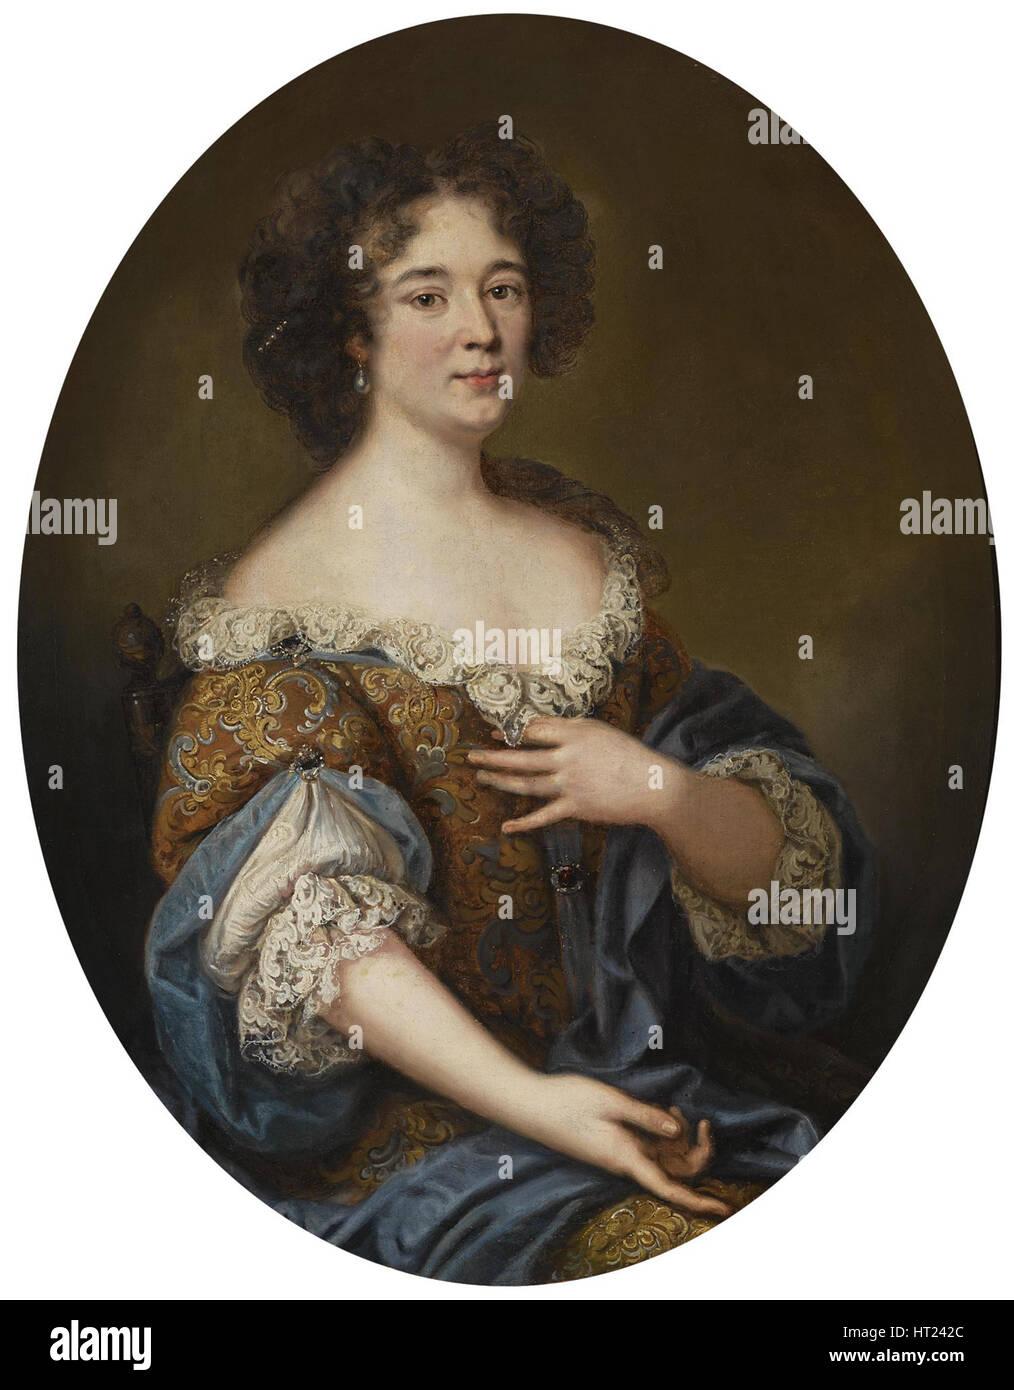 Portrait of Marie Mancini (1639-1715). Artist: Mignard, Pierre (1612-1695) - Stock Image